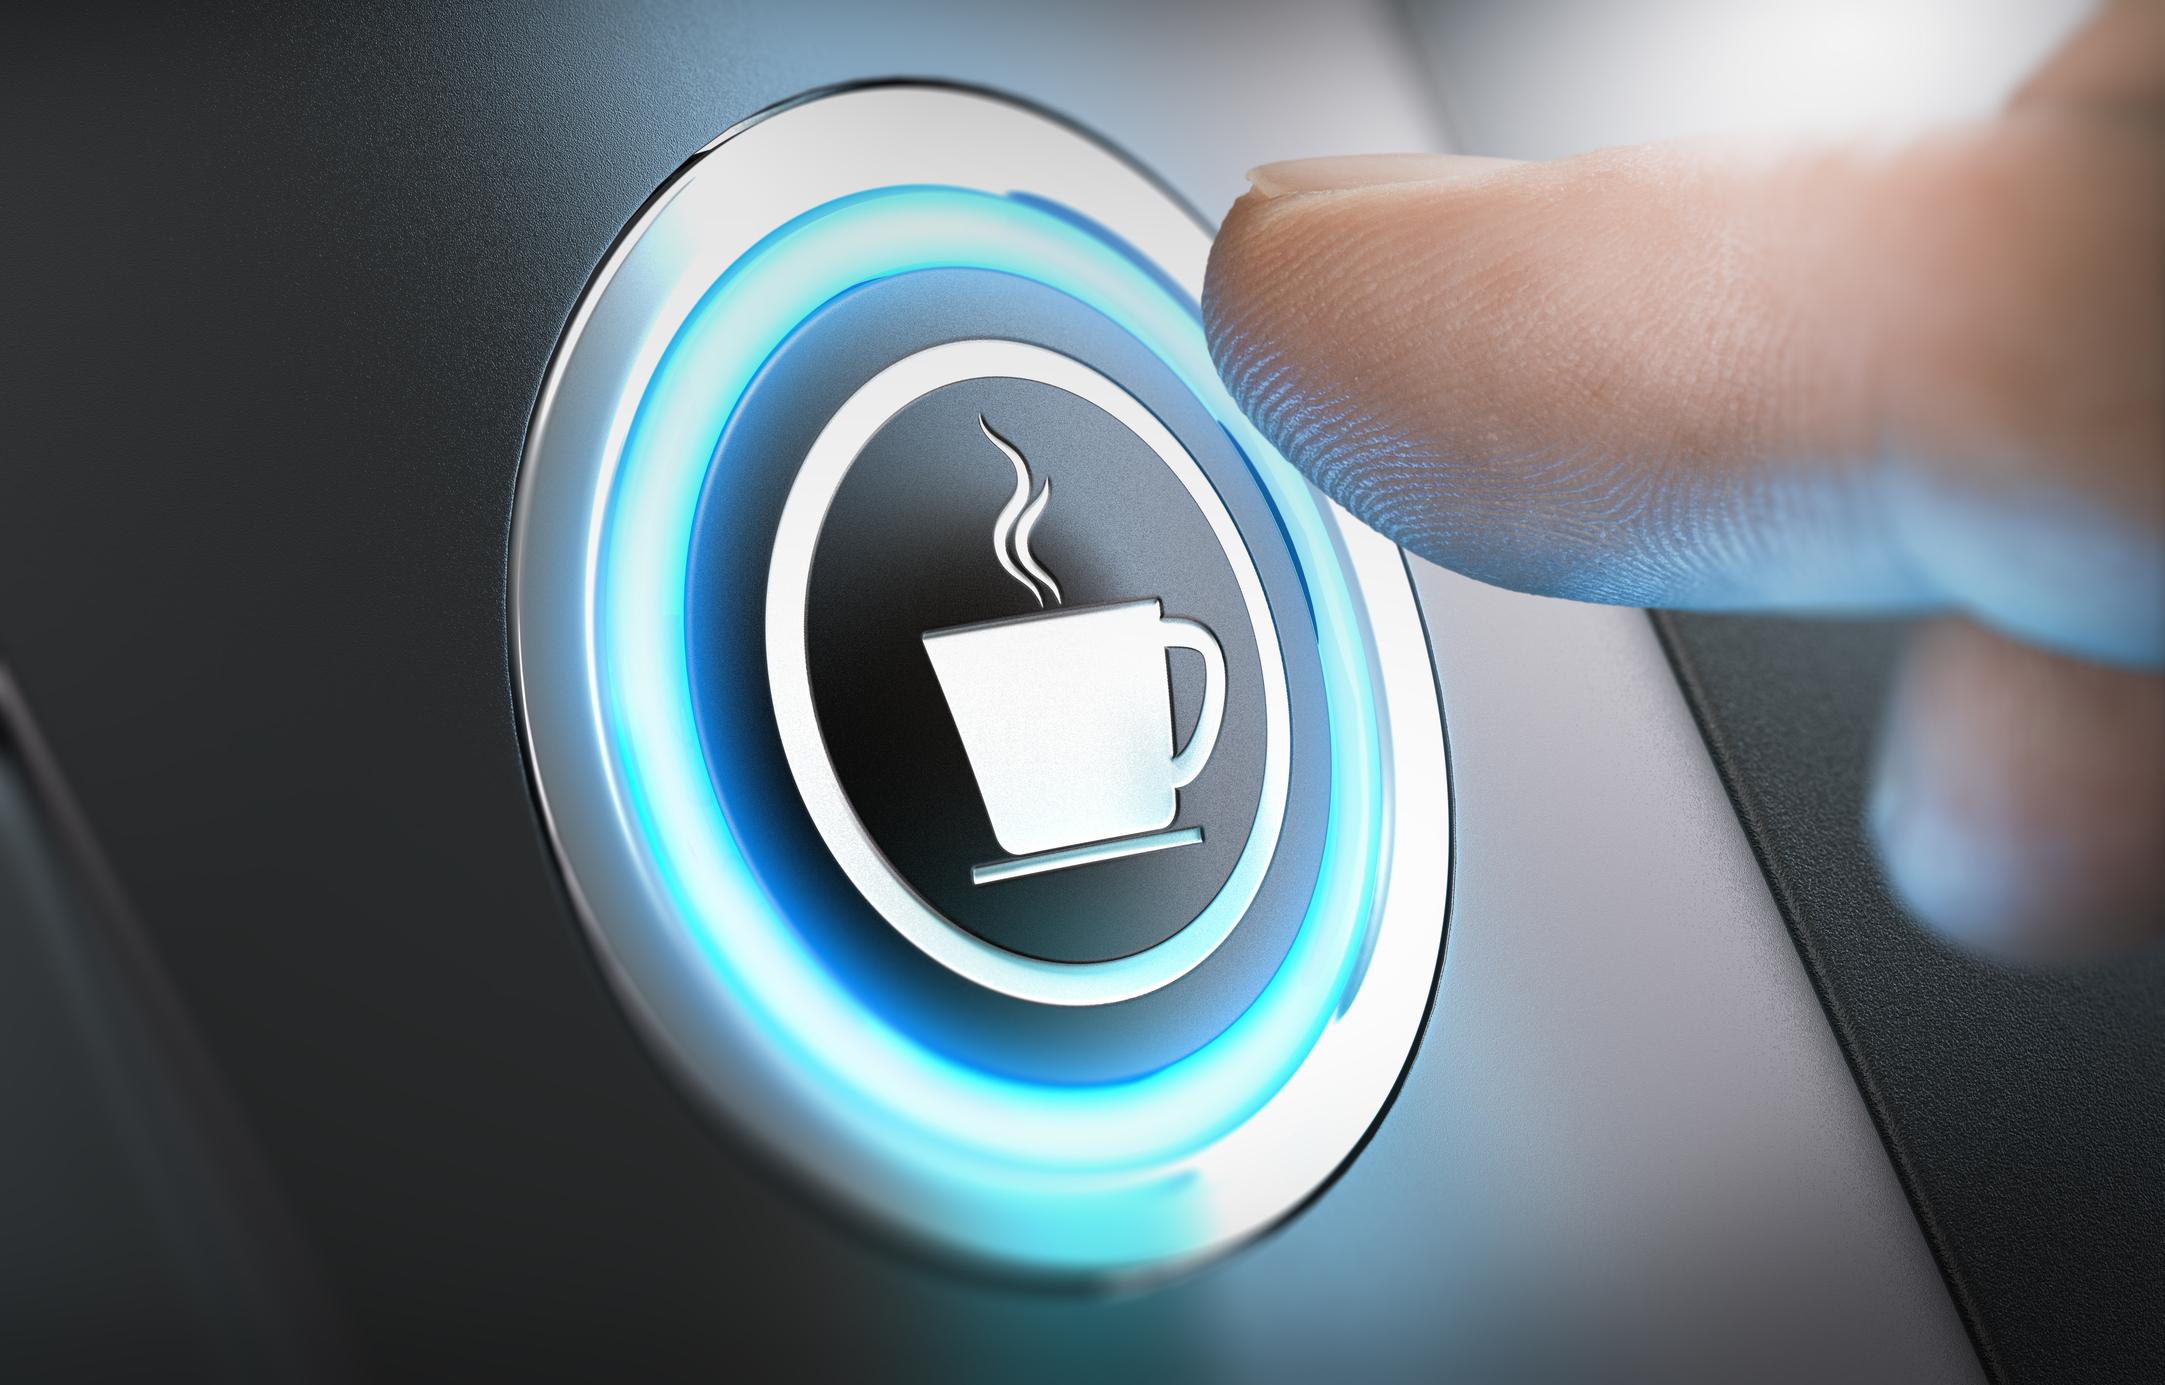 Coffee maker button